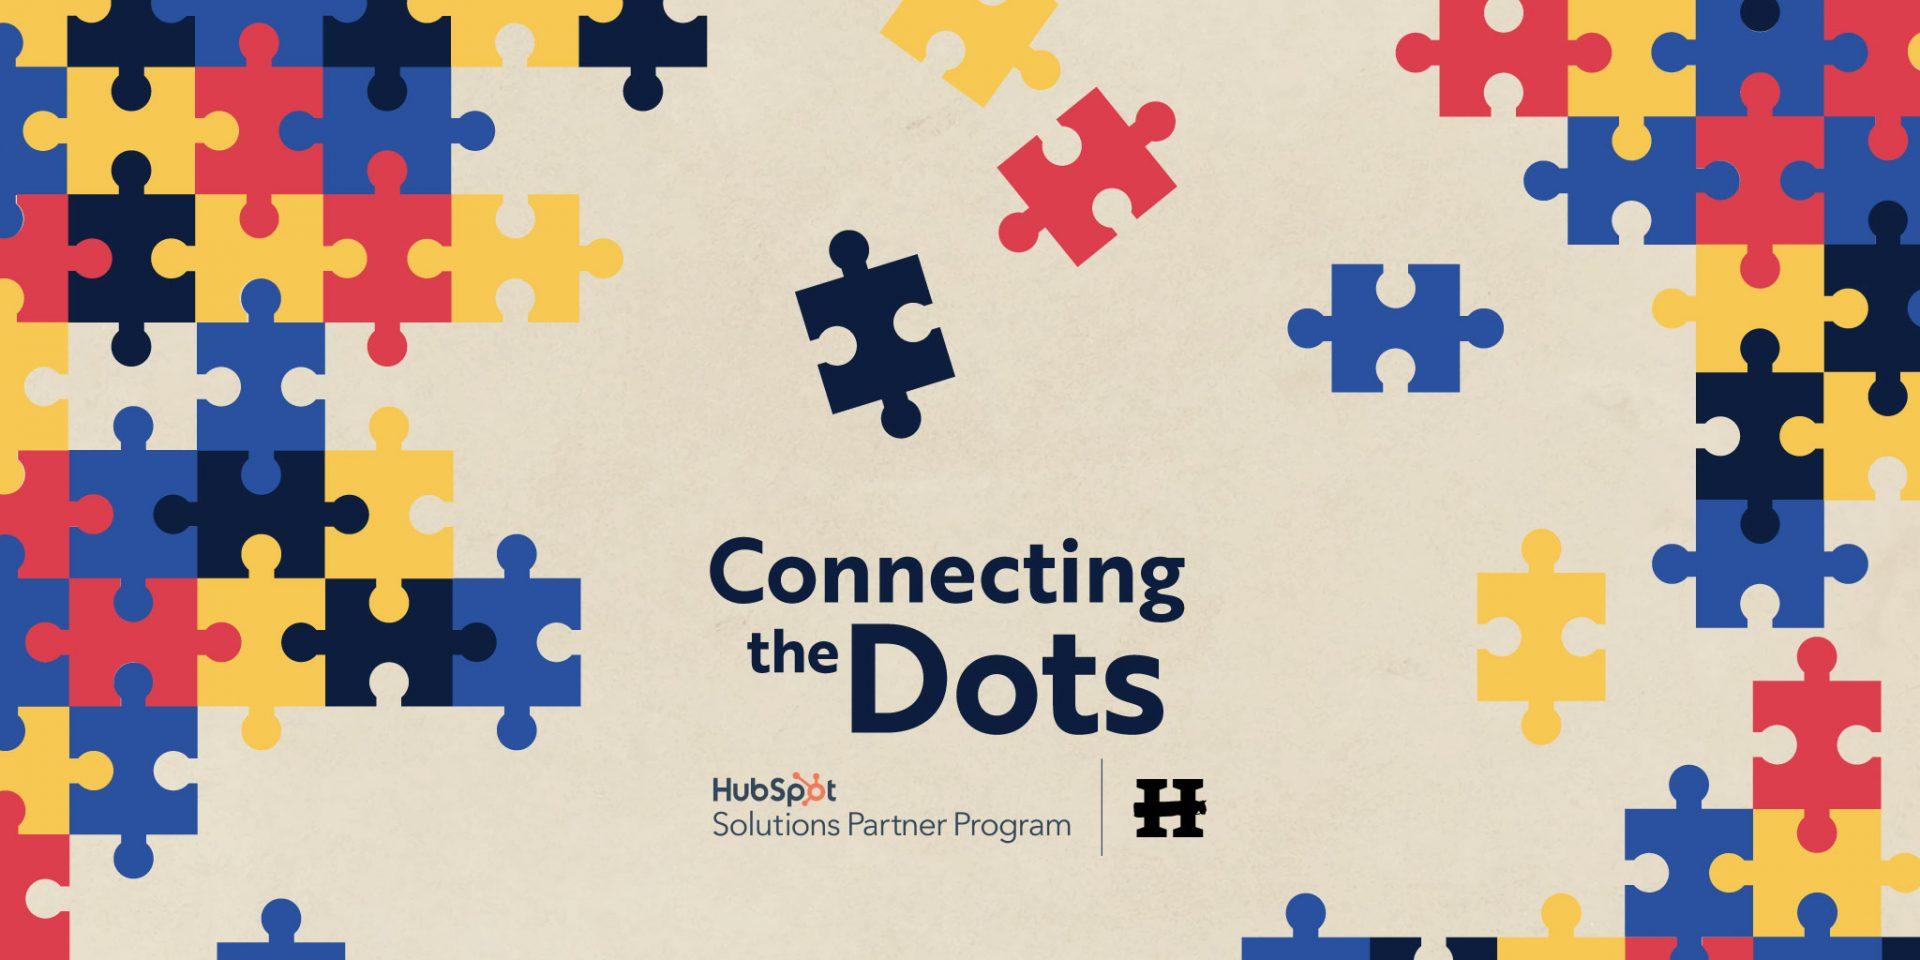 Hyphen is a HubSpot Certified Solutions Partner